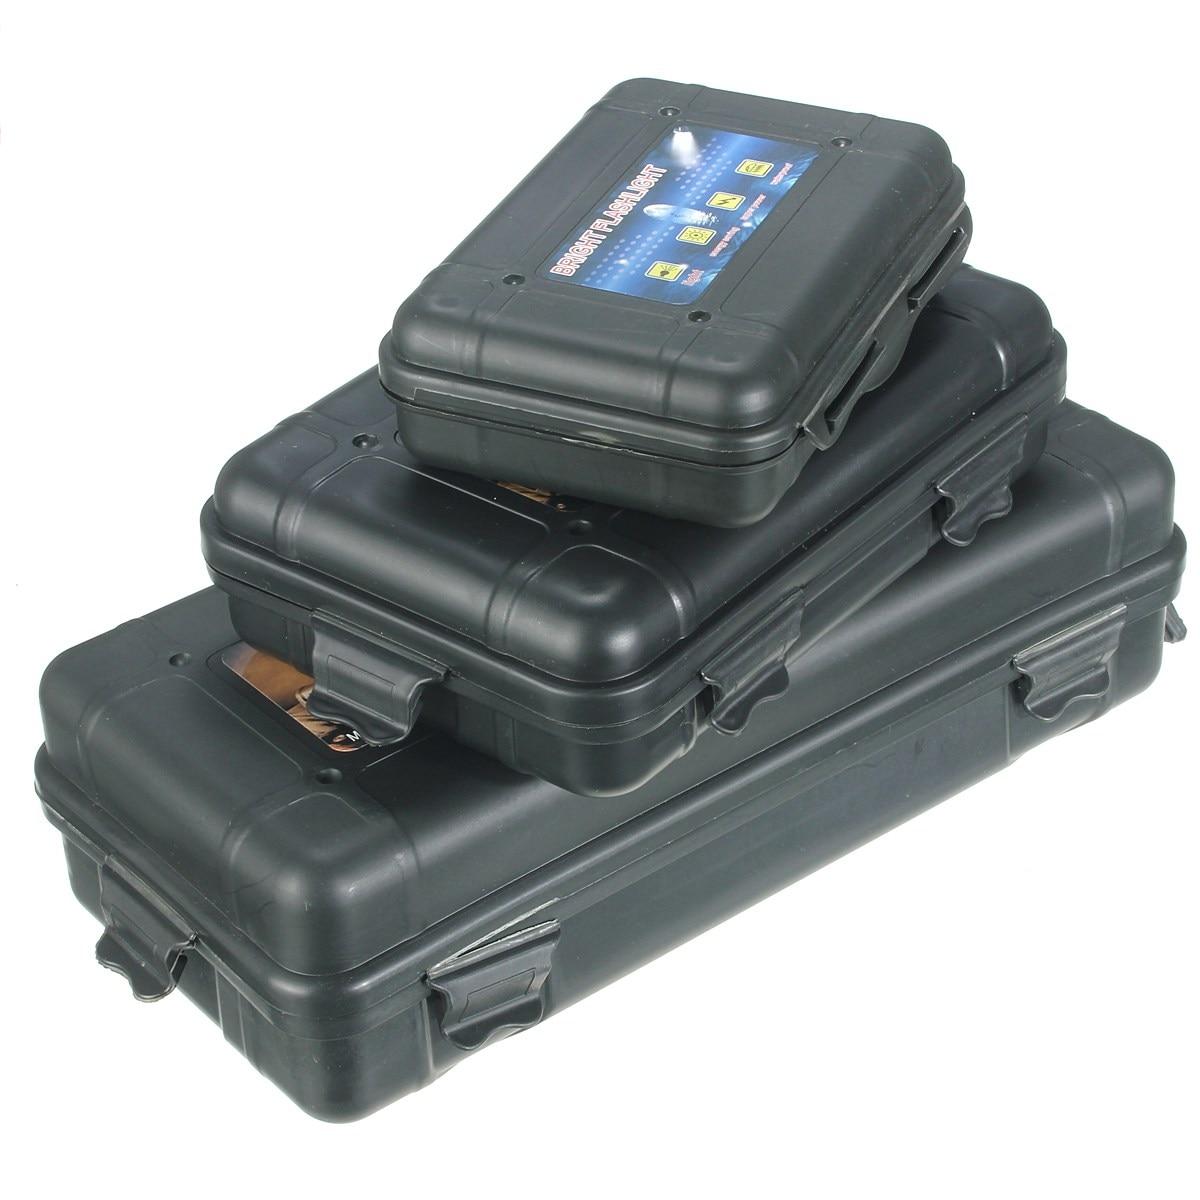 3 Size Black Plastic Flashight Tool Storage Case Box For 18650 14500 LED Flashlight For Outdooors Camping Hiking